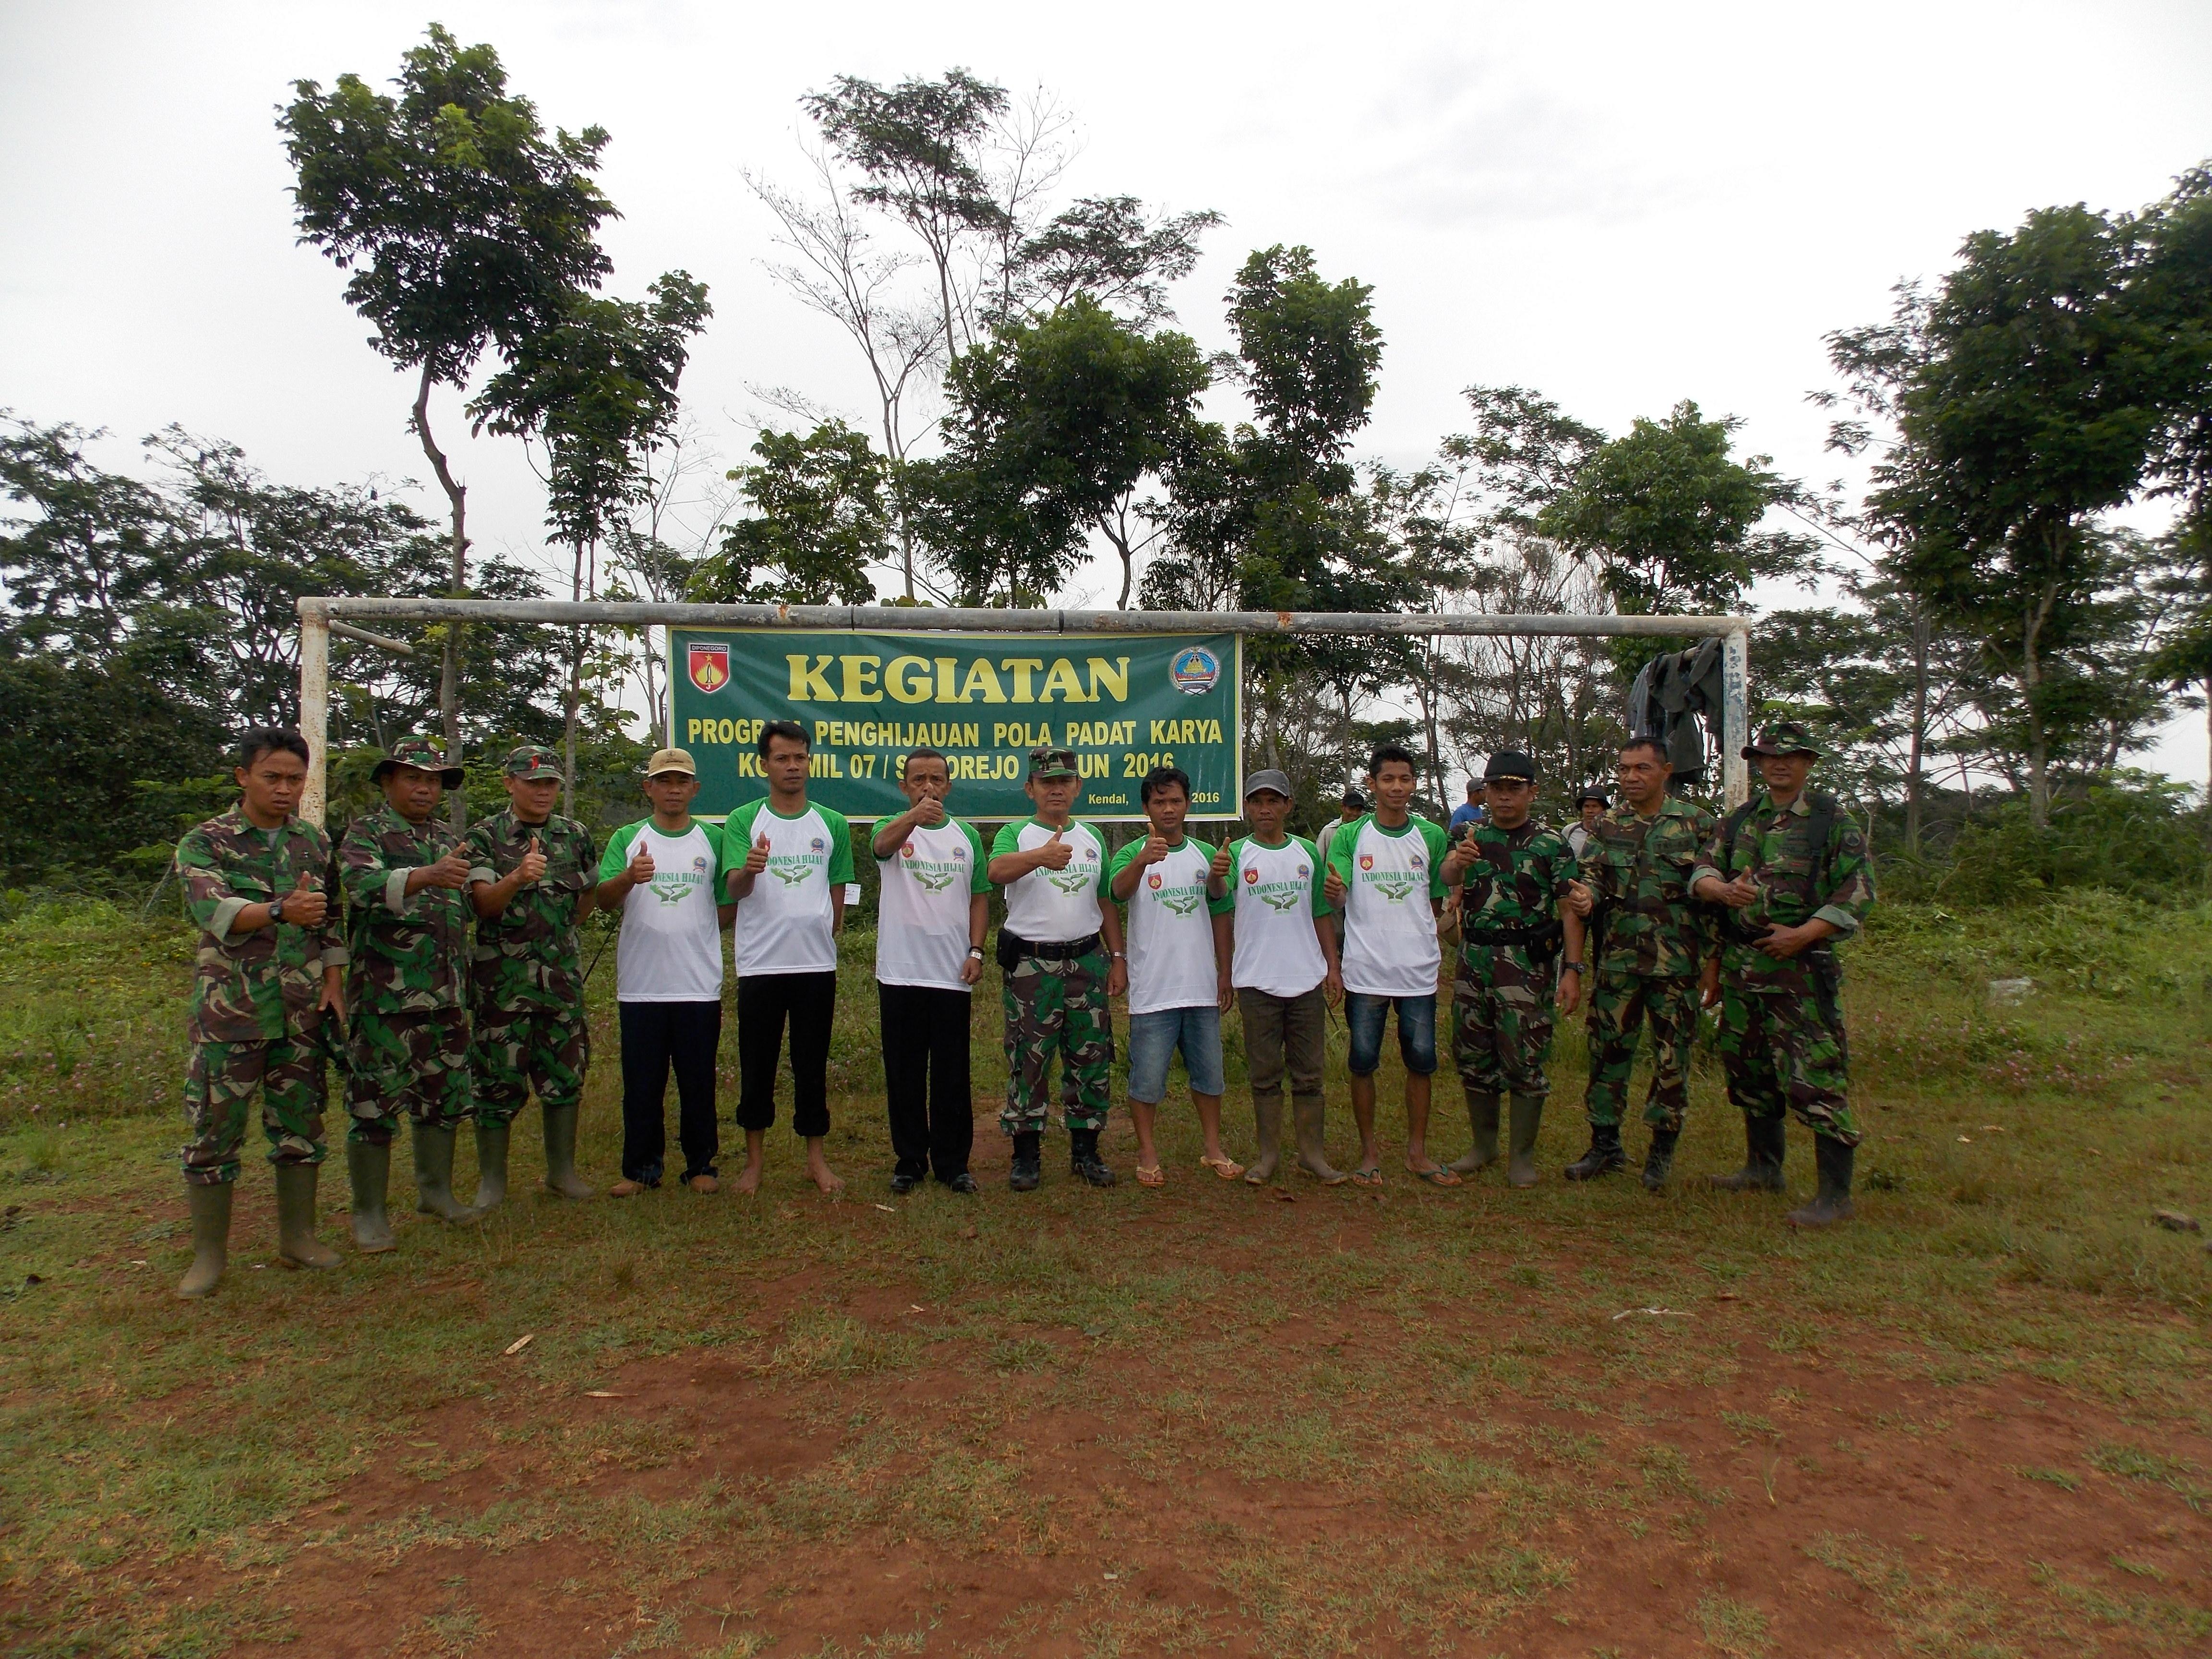 Program Penghijauan Pola Padat Karya Koramil Sukorejo Tahun 2016